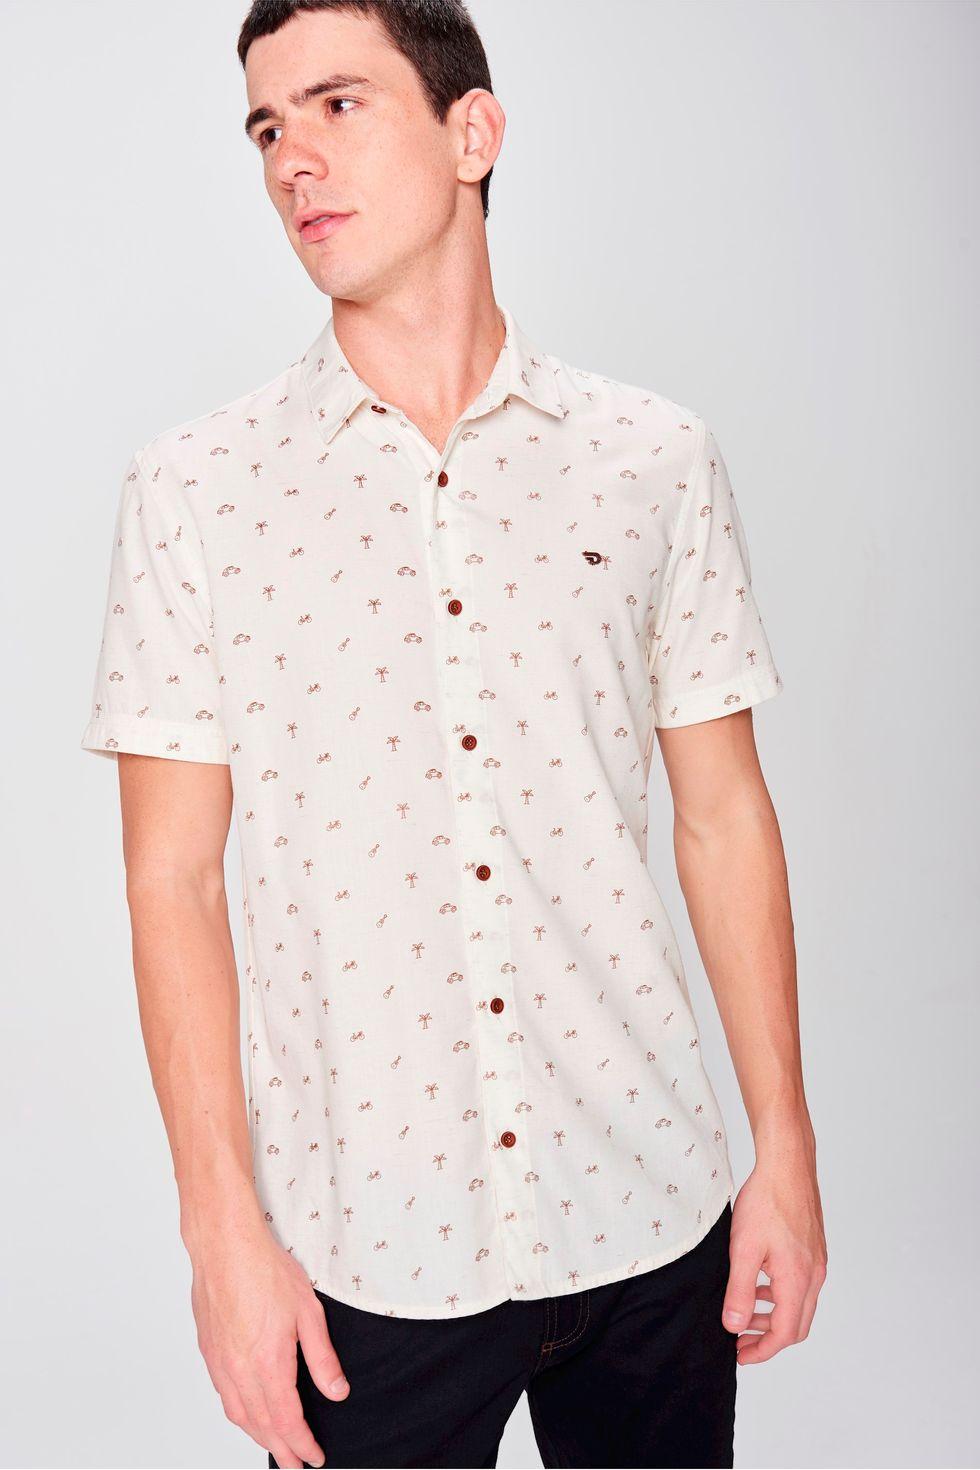 d2e41b656e92e Camisa Manga Curta Estampada Masculina - Damyller